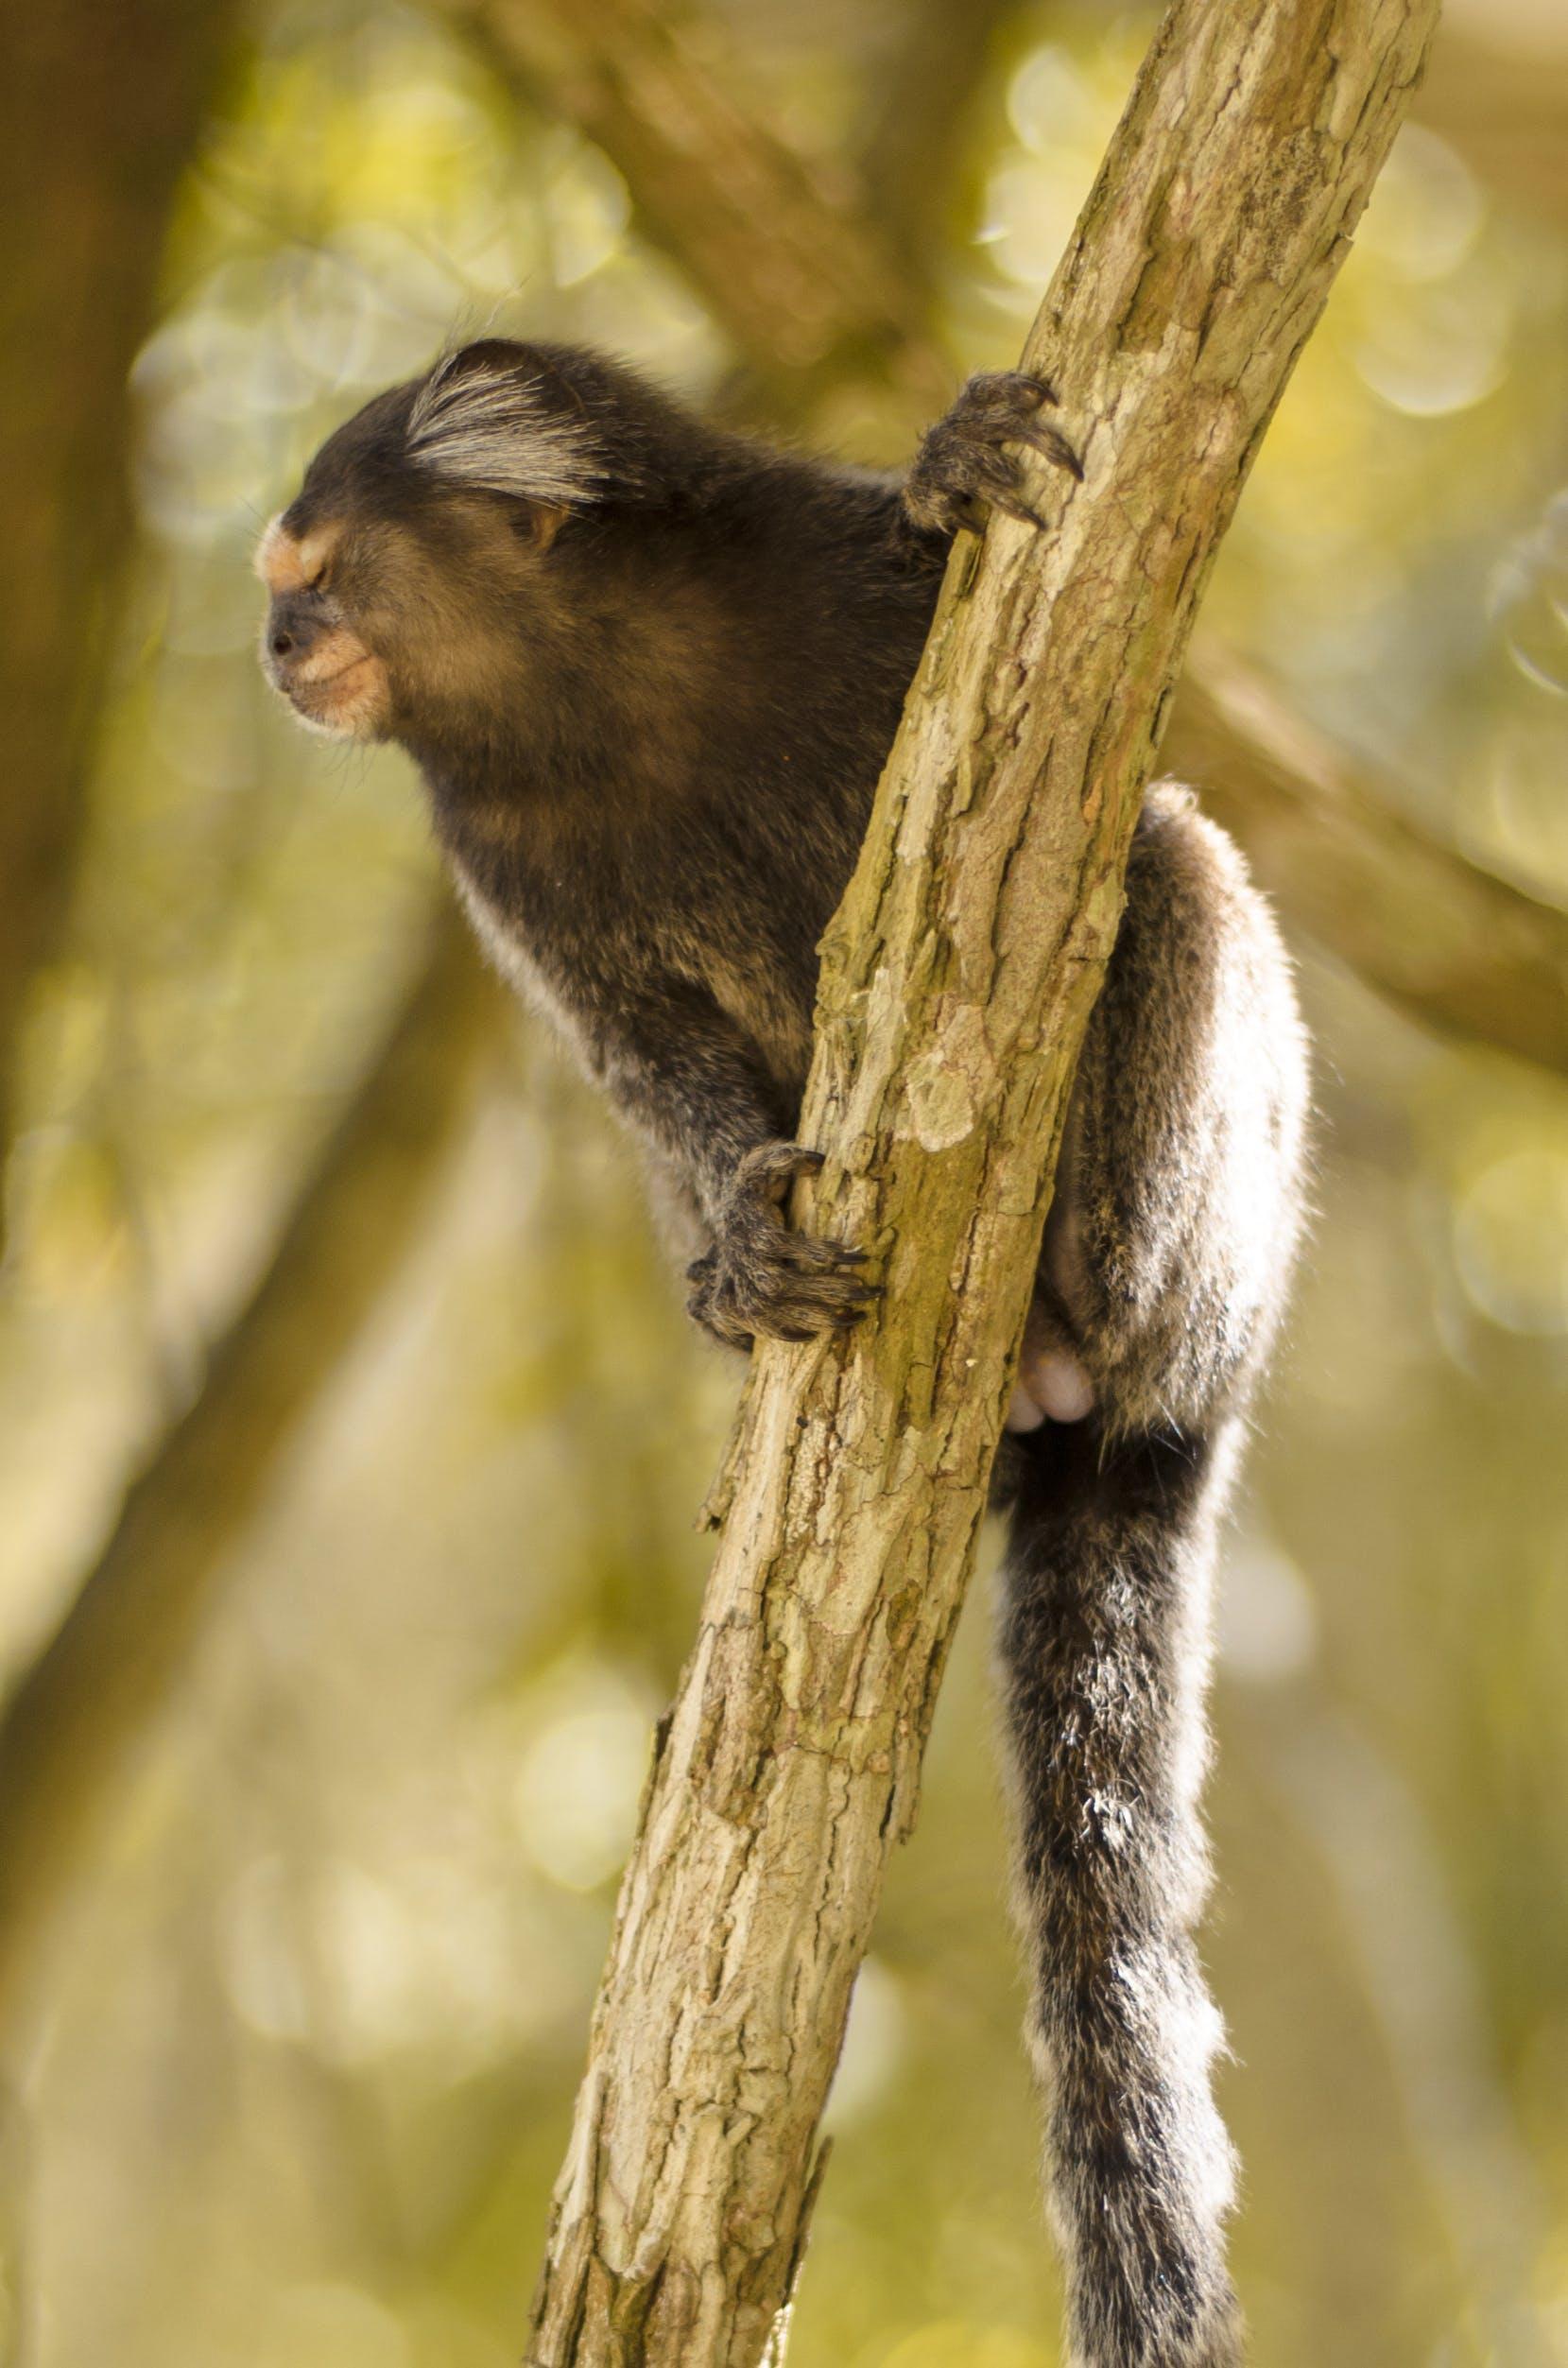 Free stock photo of animal, botanical garden, brasil, brazil